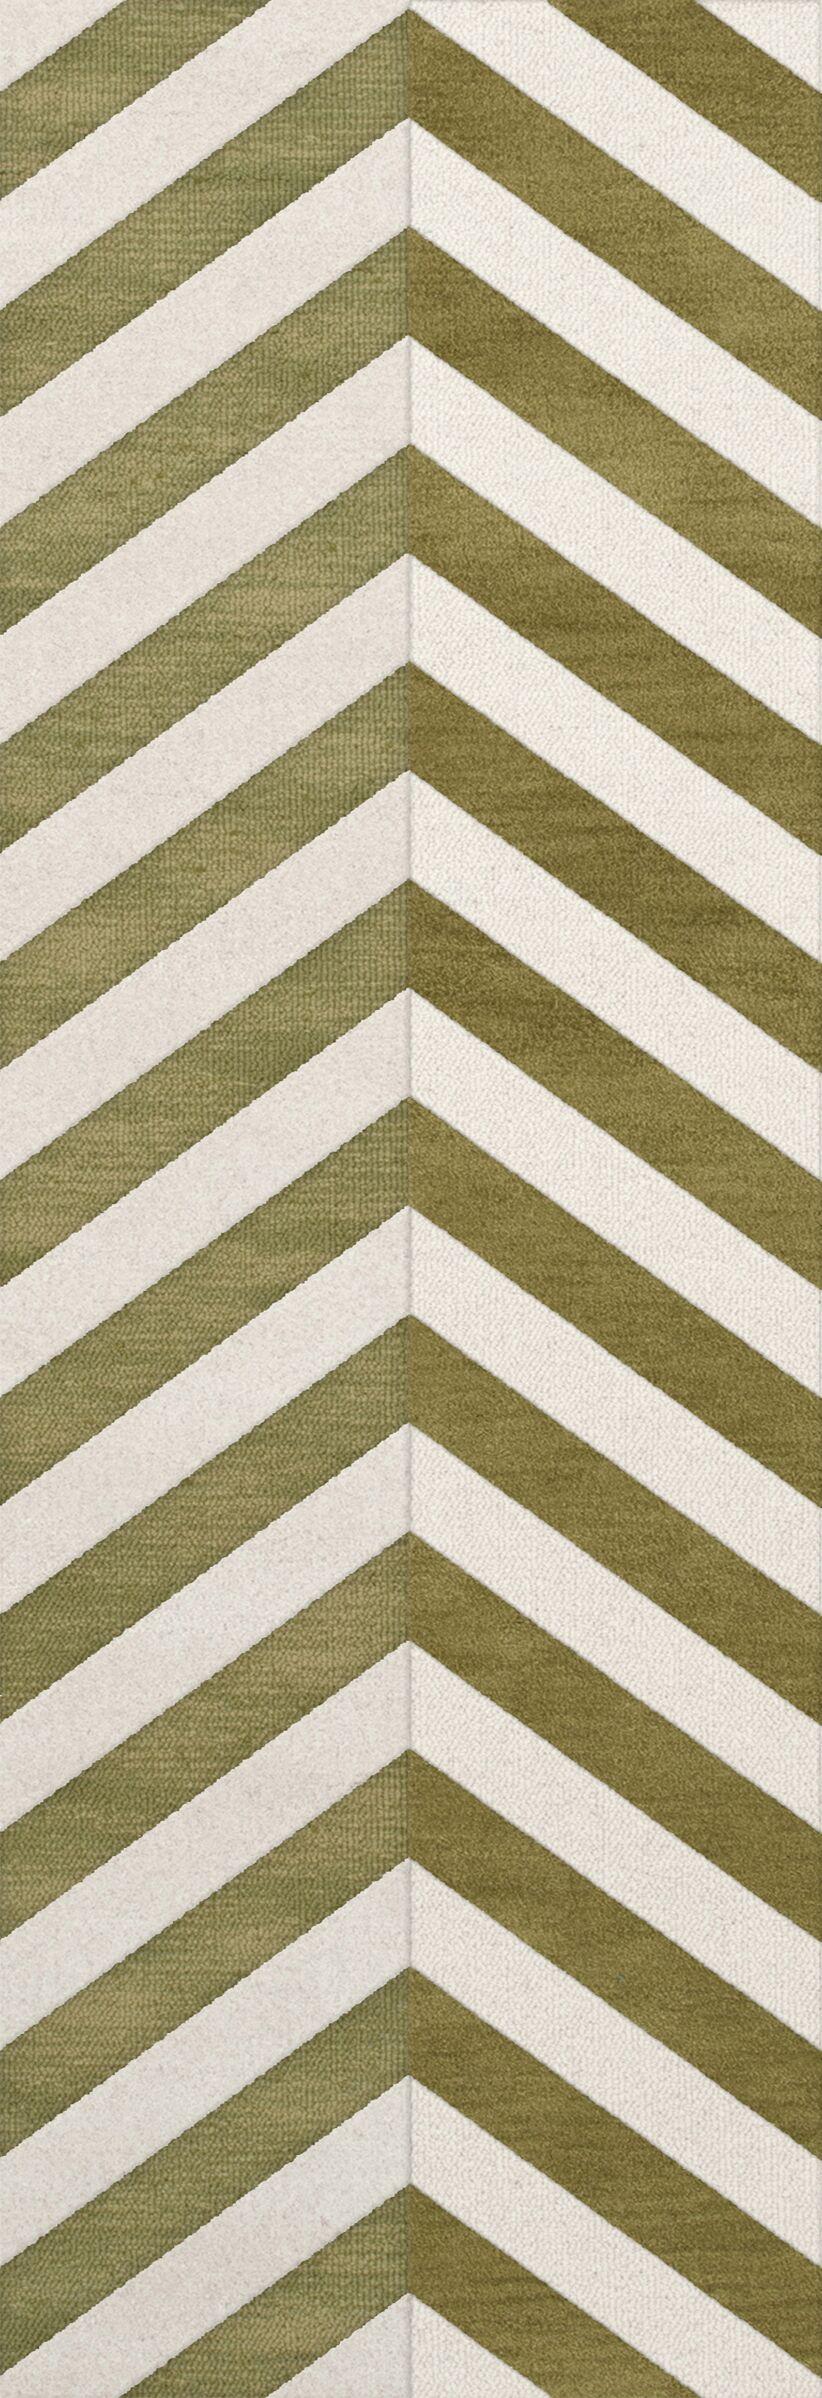 Shellenbarger Wool Herb/White Area Rug Rug Size: Runner 2'6